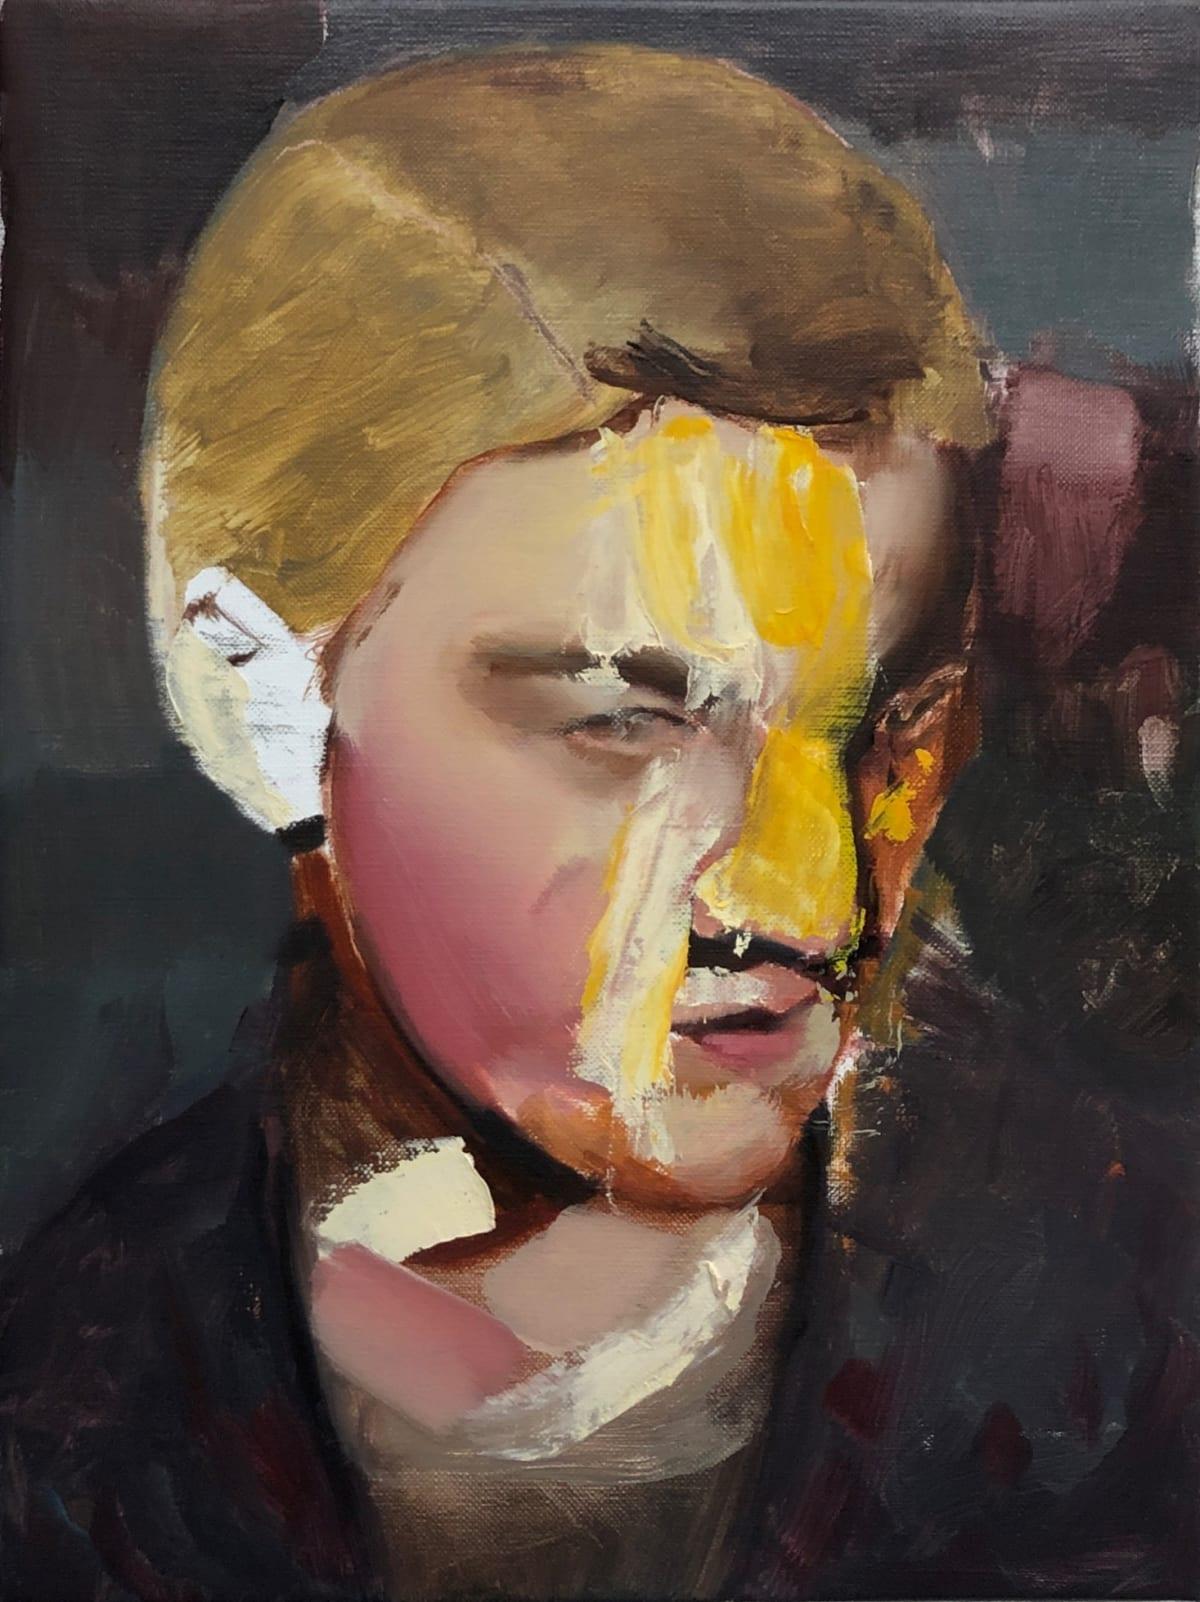 Matteo Venturi Study for a head , 2020 Oil, Wax on Linen 30 x 40 cm 12 x 16 in